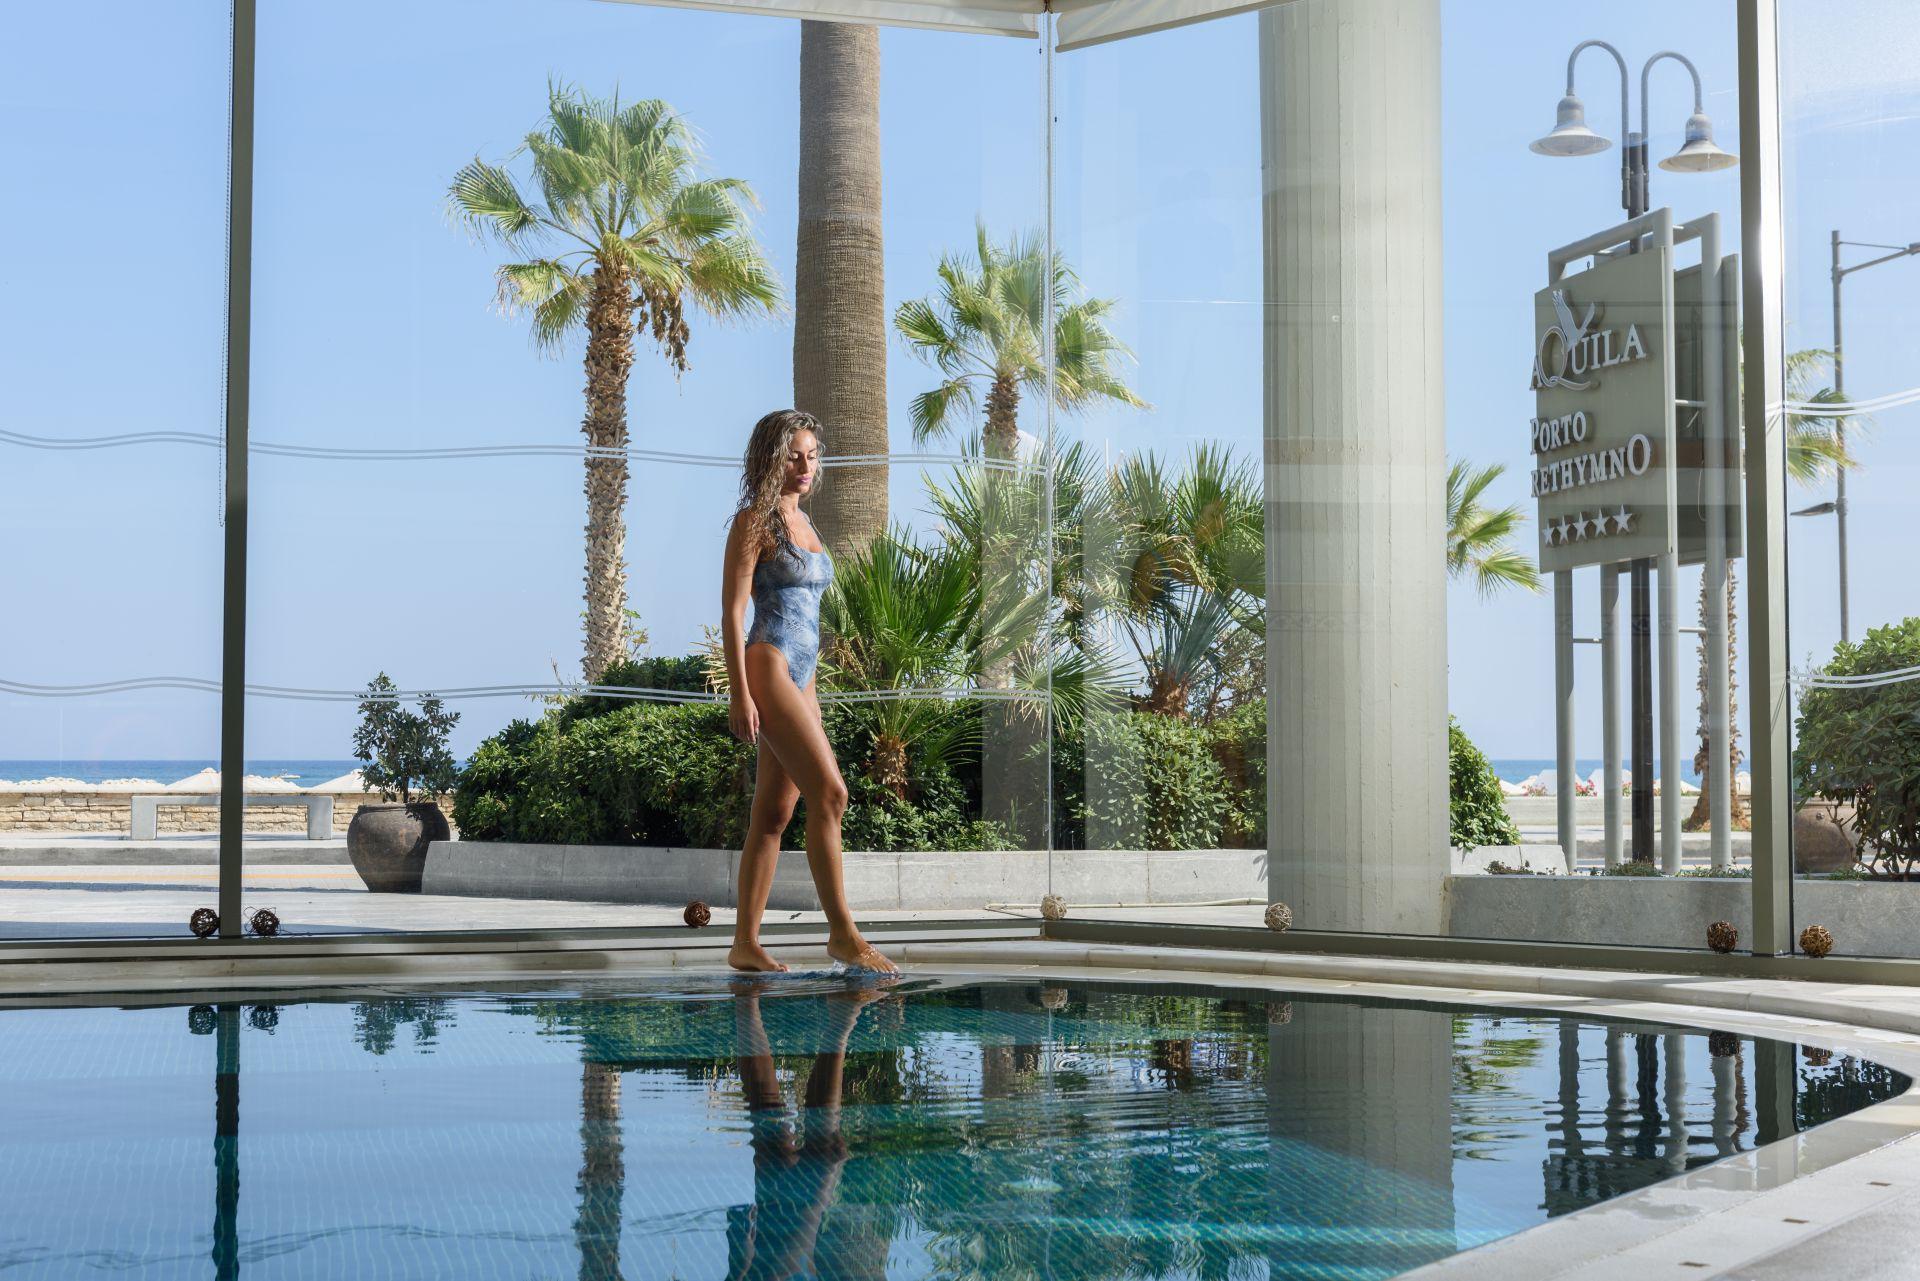 Aquila Porto Rethymno Hotel Indoor Pool Hotels In Crete Aquila Hotels Resorts